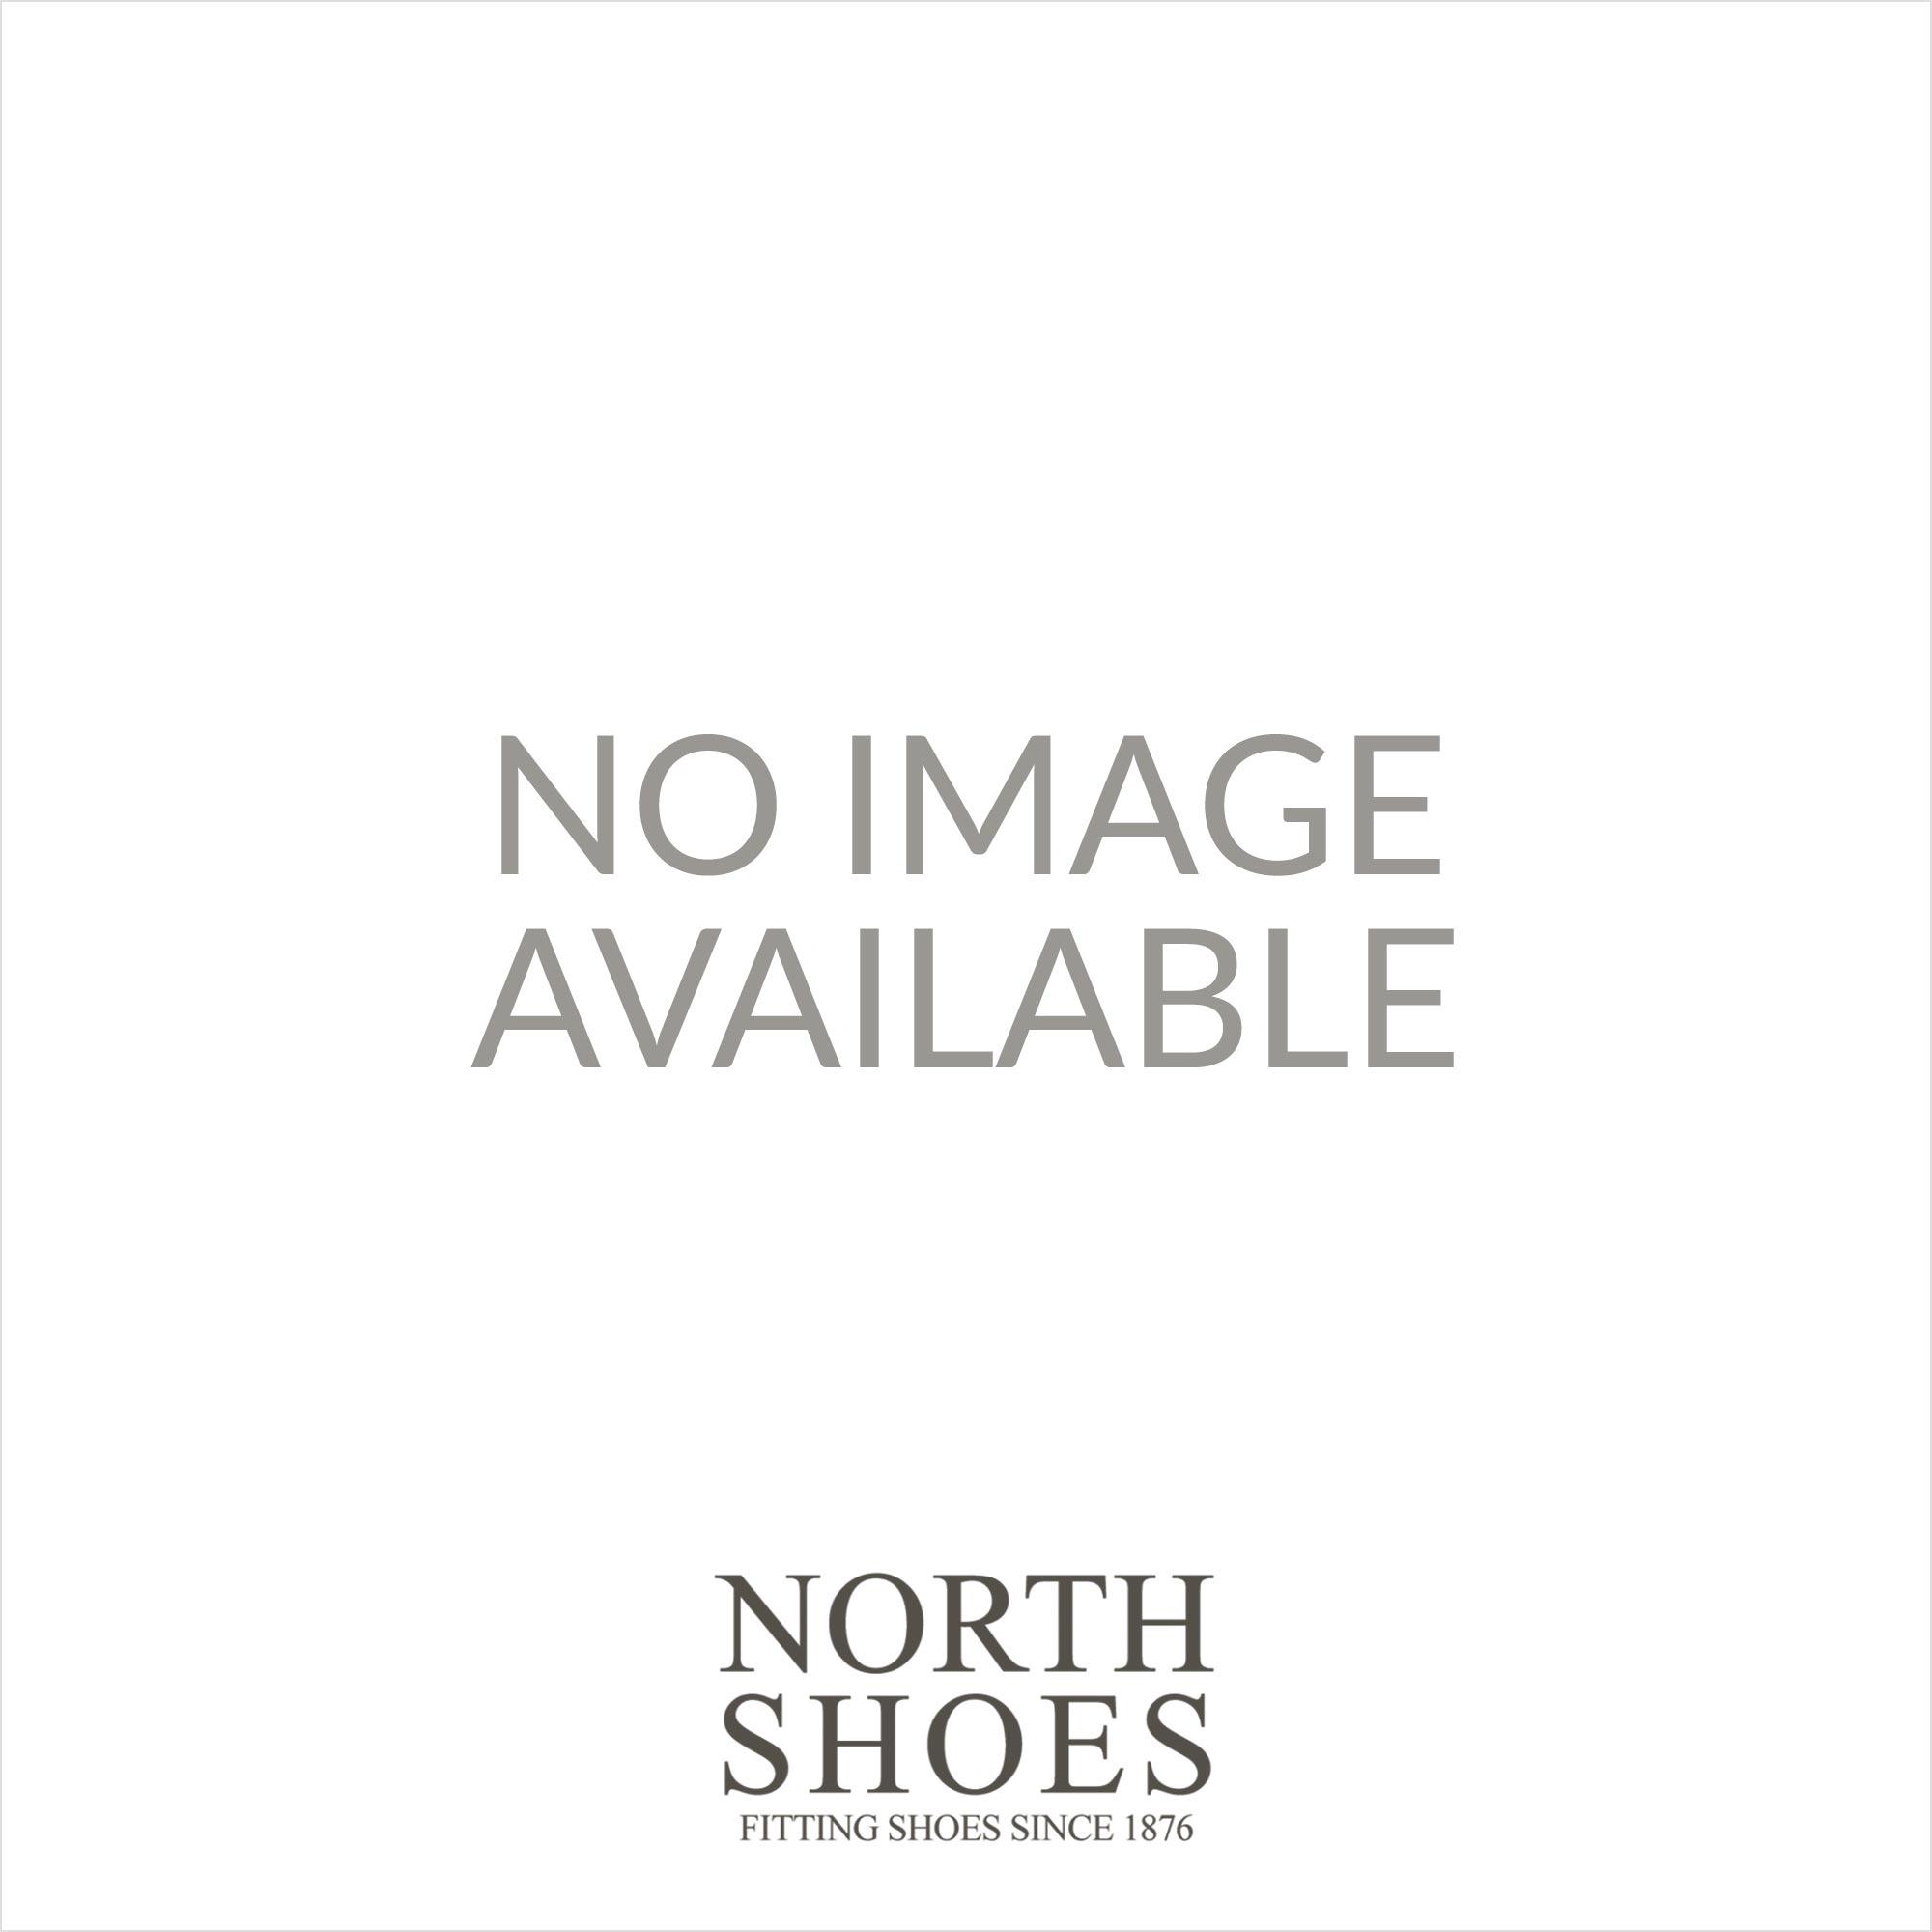 f5bc062dd8d62 Clarks Glement Slip Black Leather Mens Formal Slip On Shoe - Clarks from  North Shoes UK